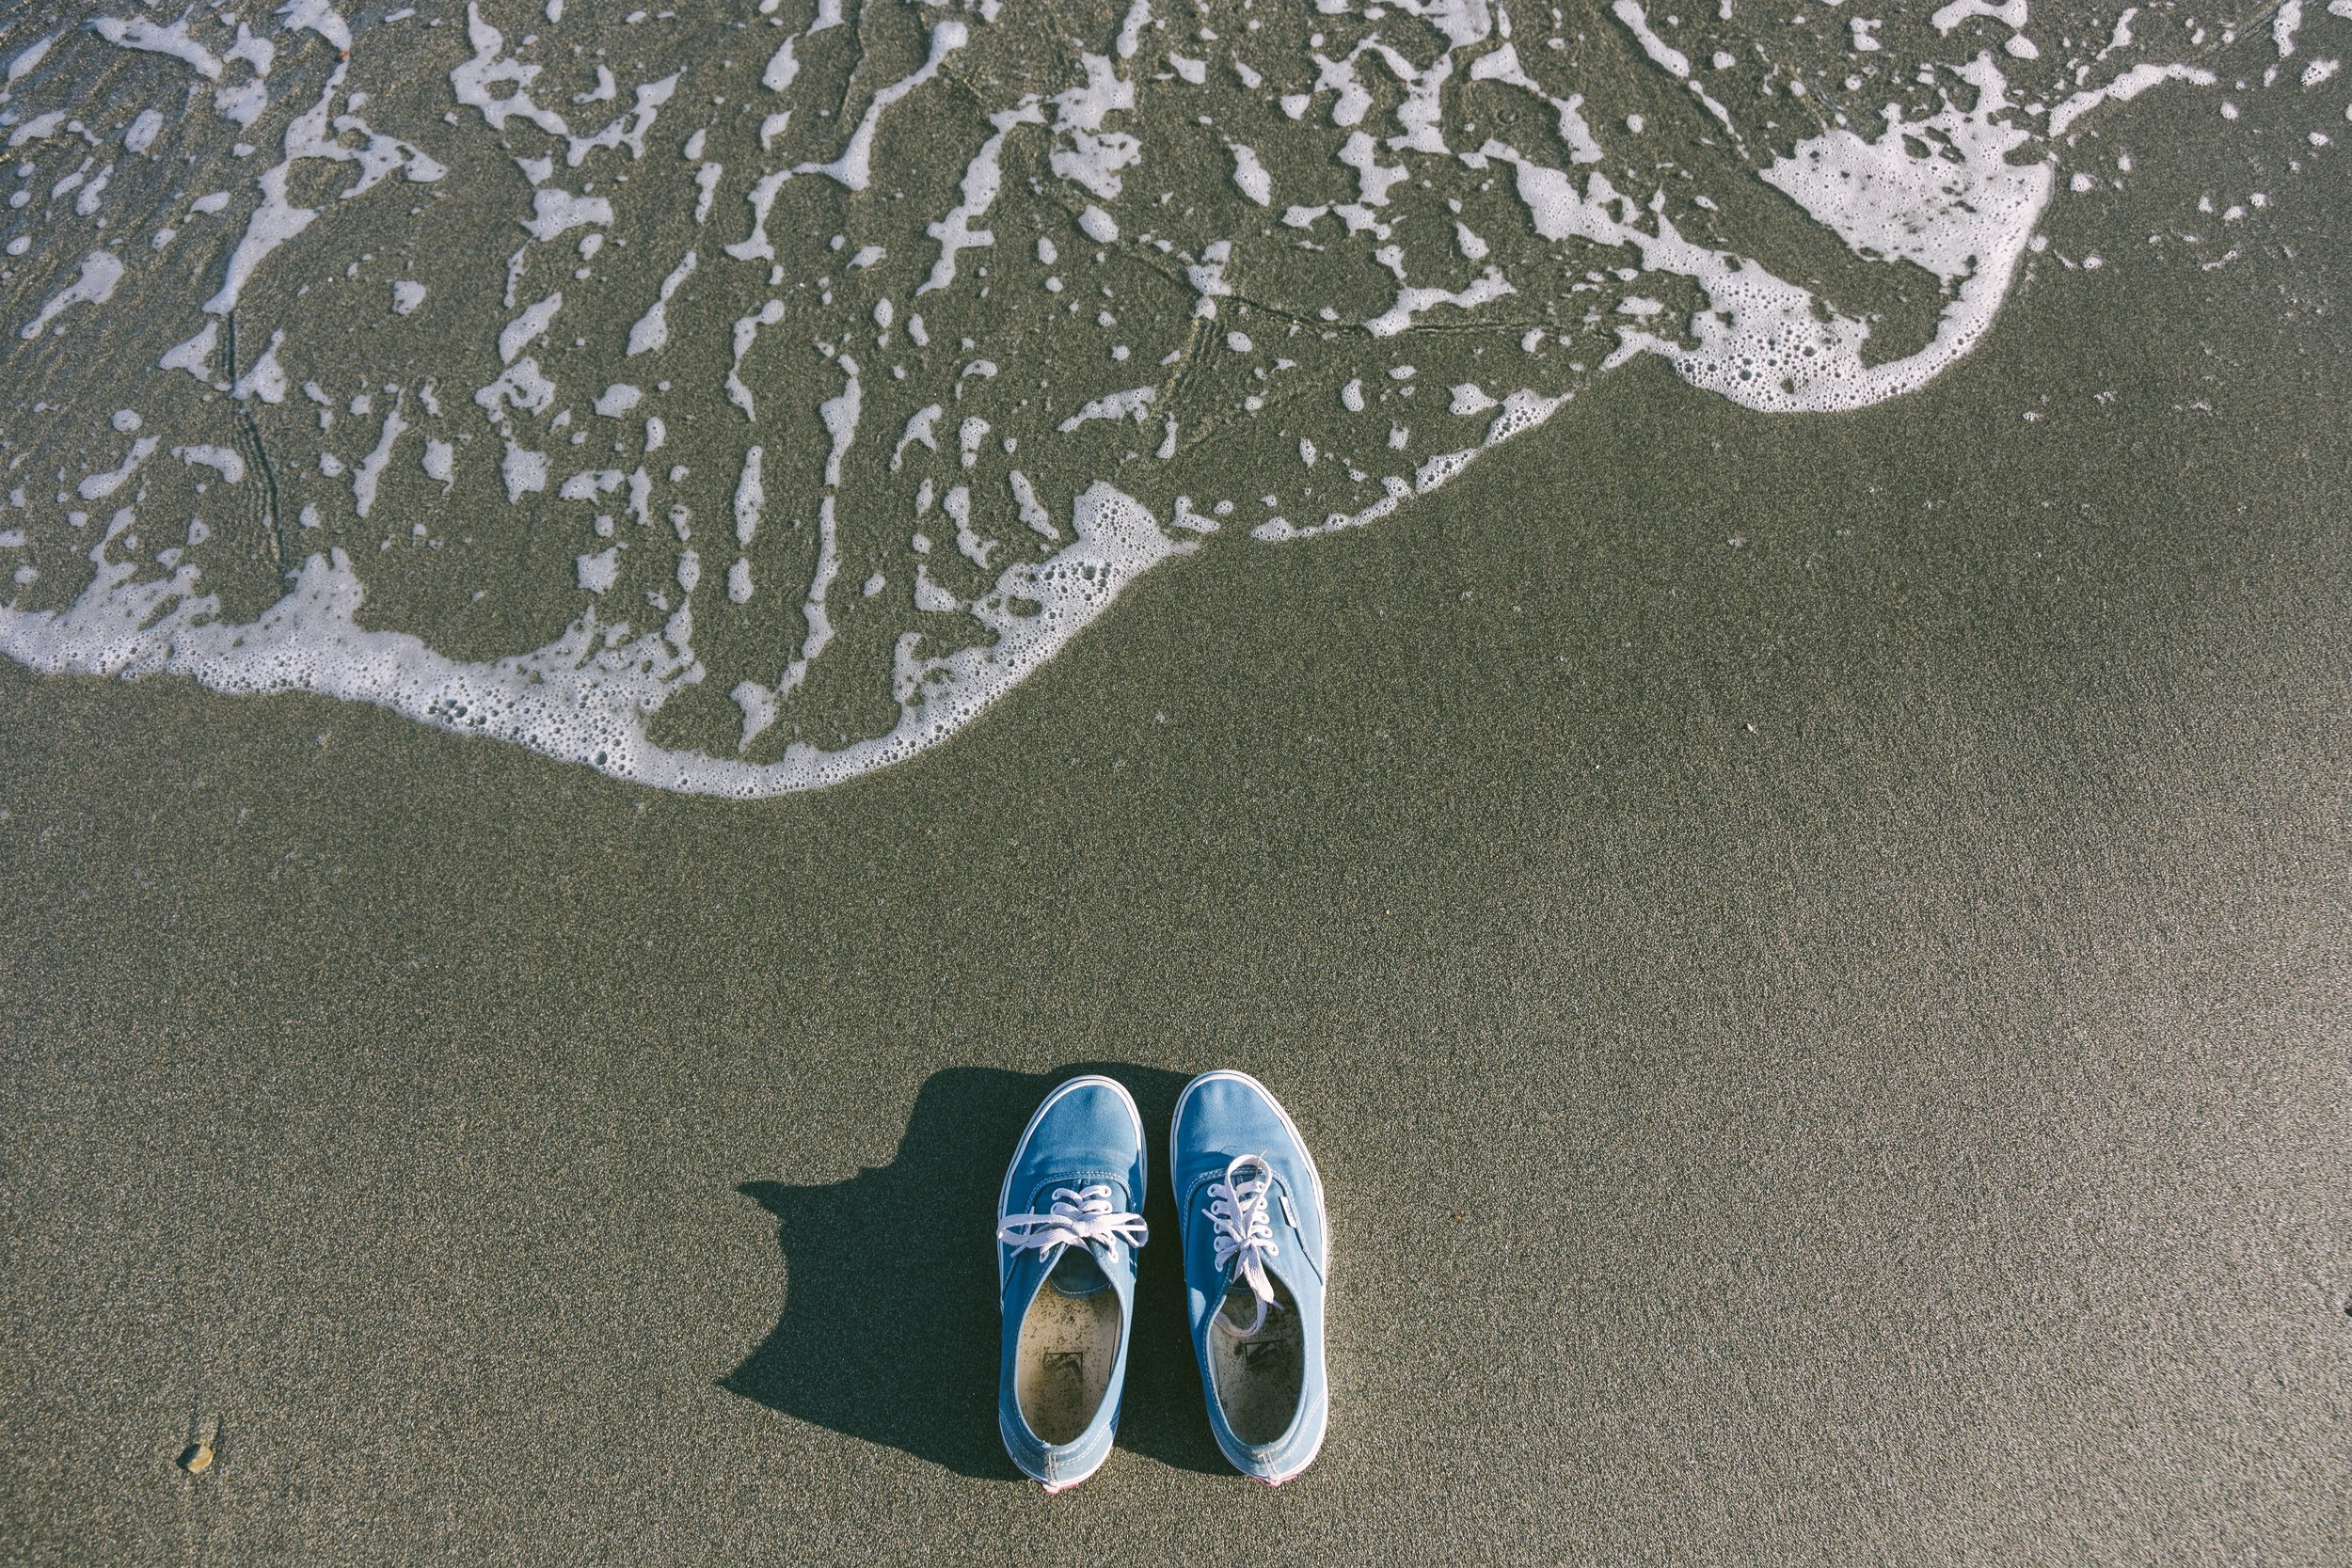 beach-blue-colors-1150618